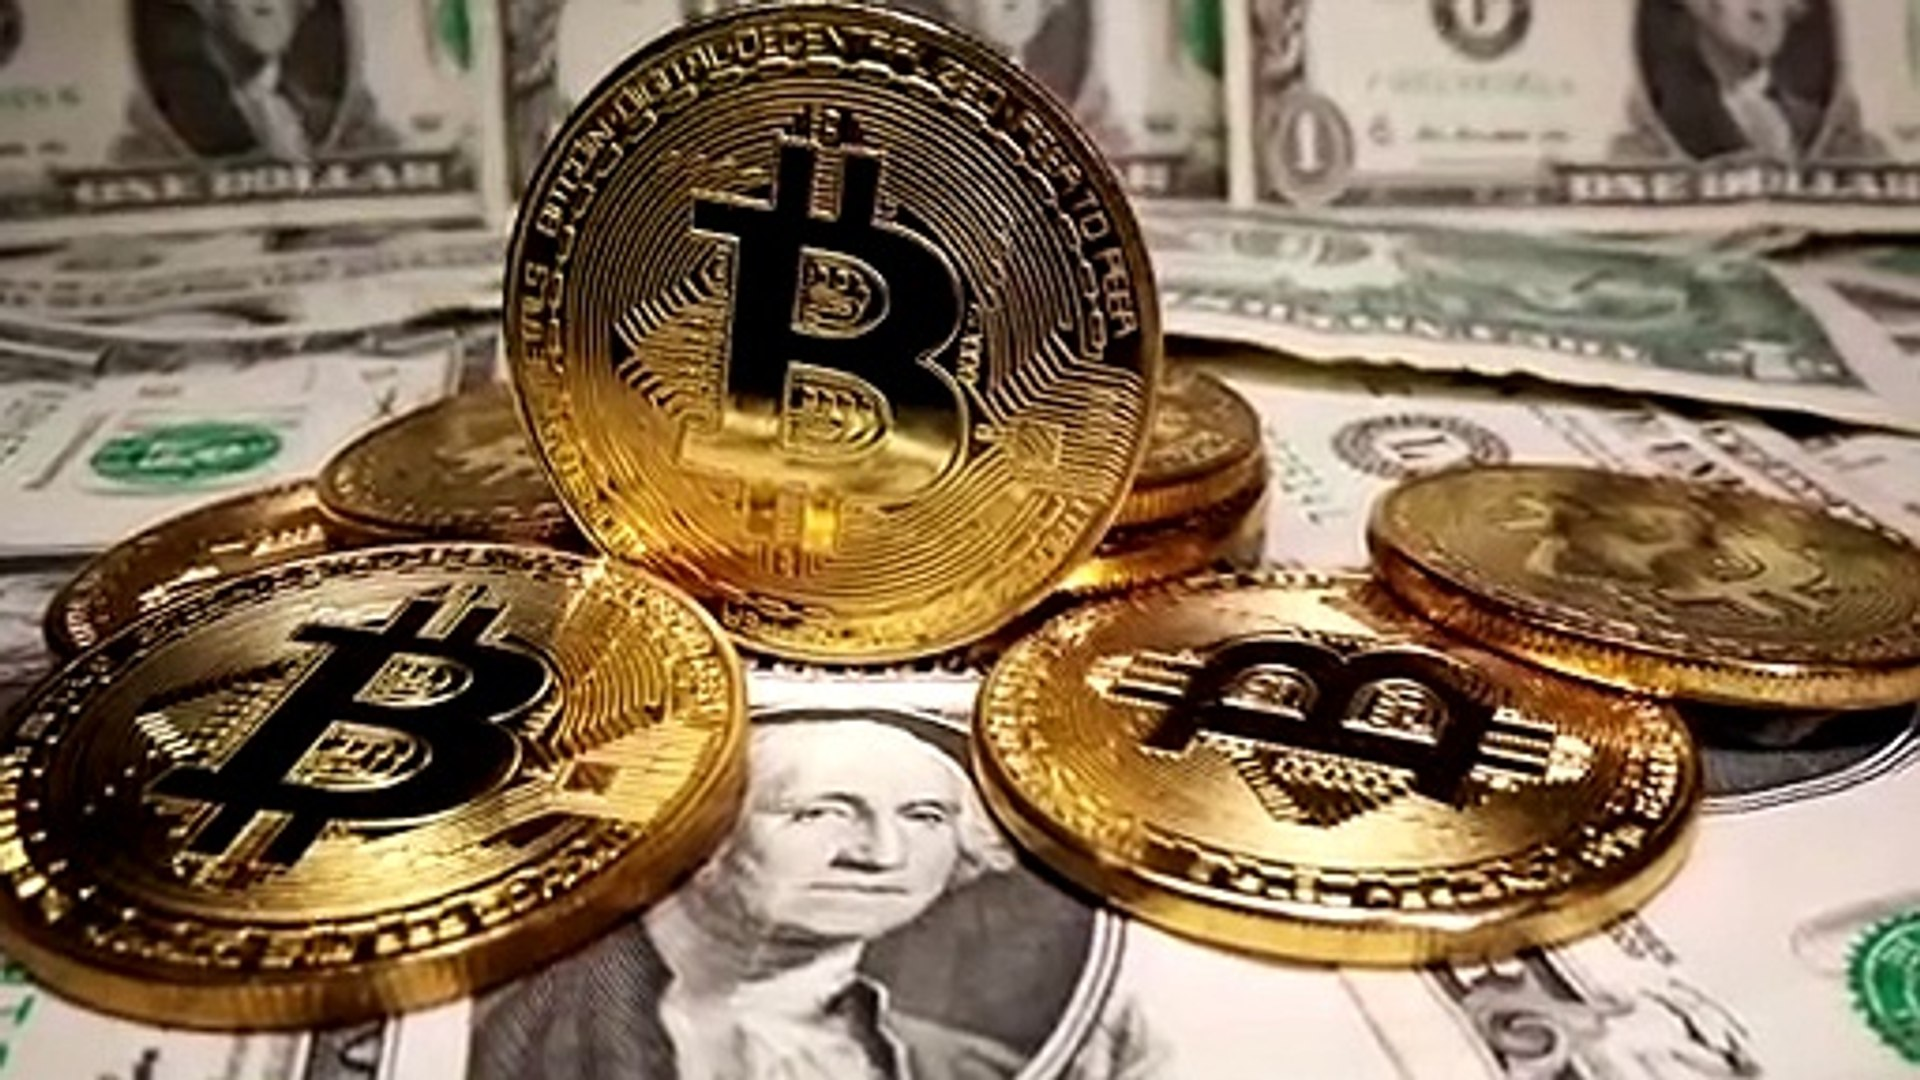 Bitcoin hits record on BNY Mellon crypto move